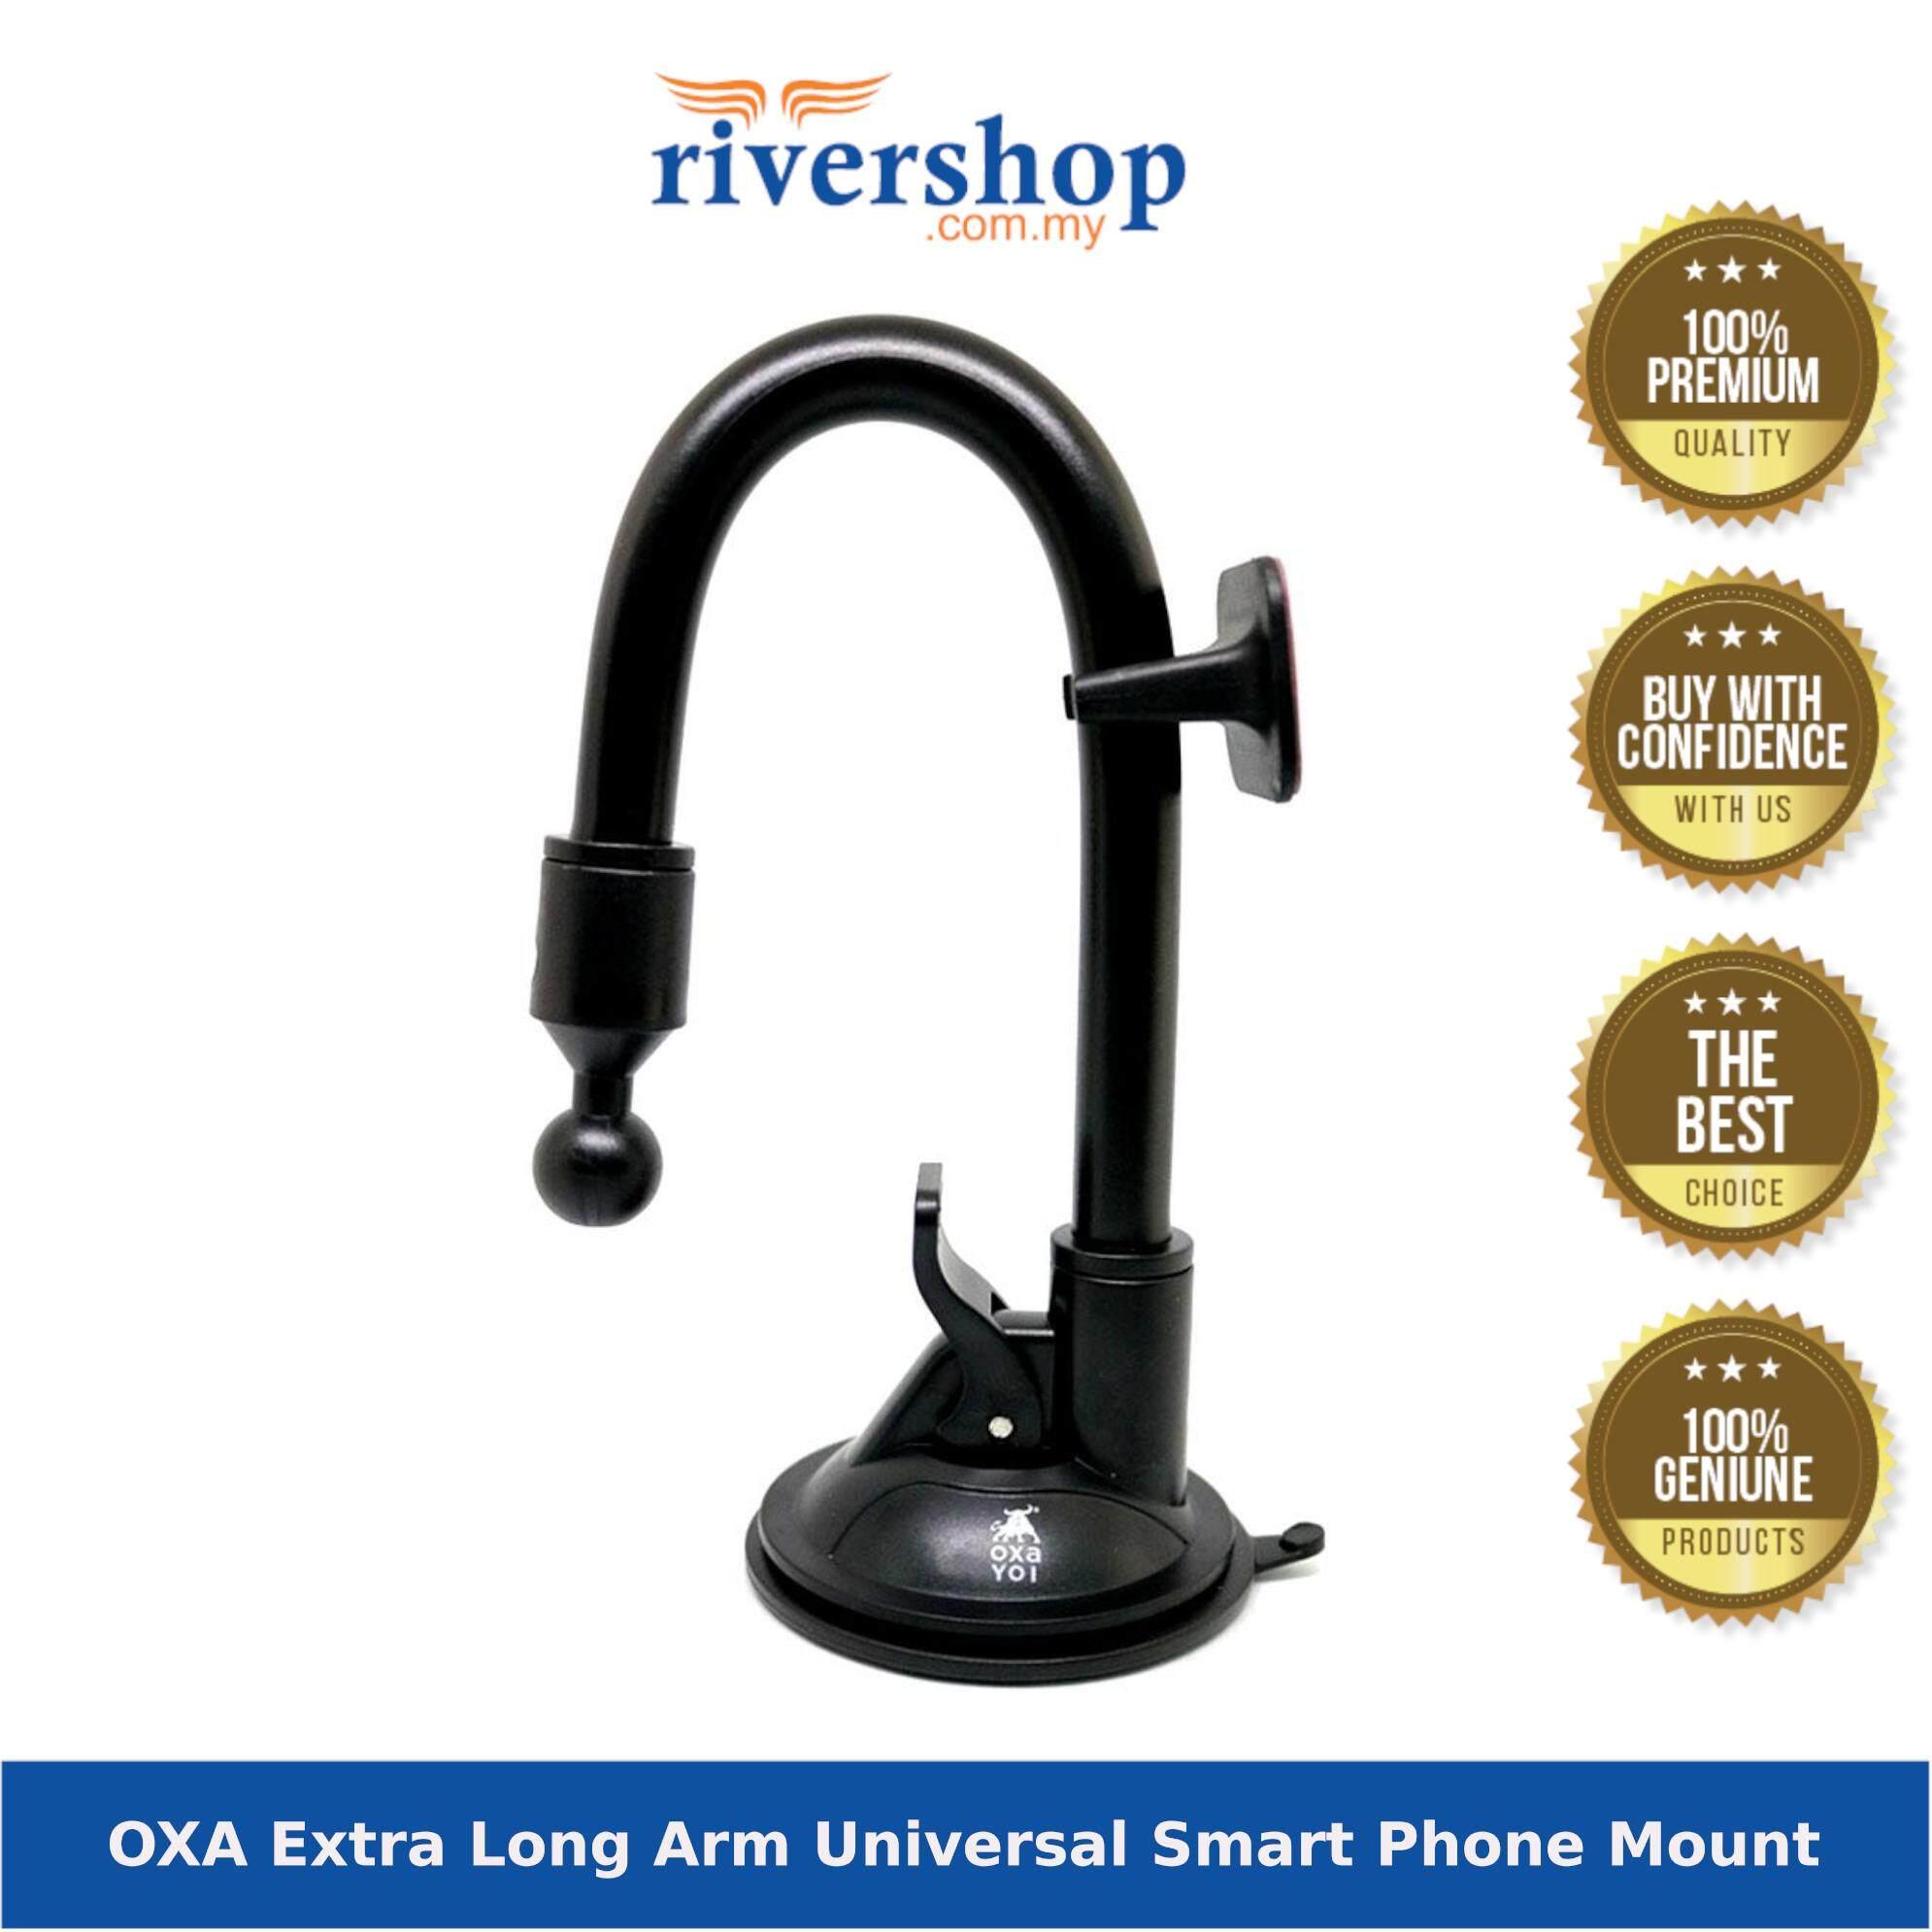 OXA Extra Long Arm Universal Smart Phone Mount